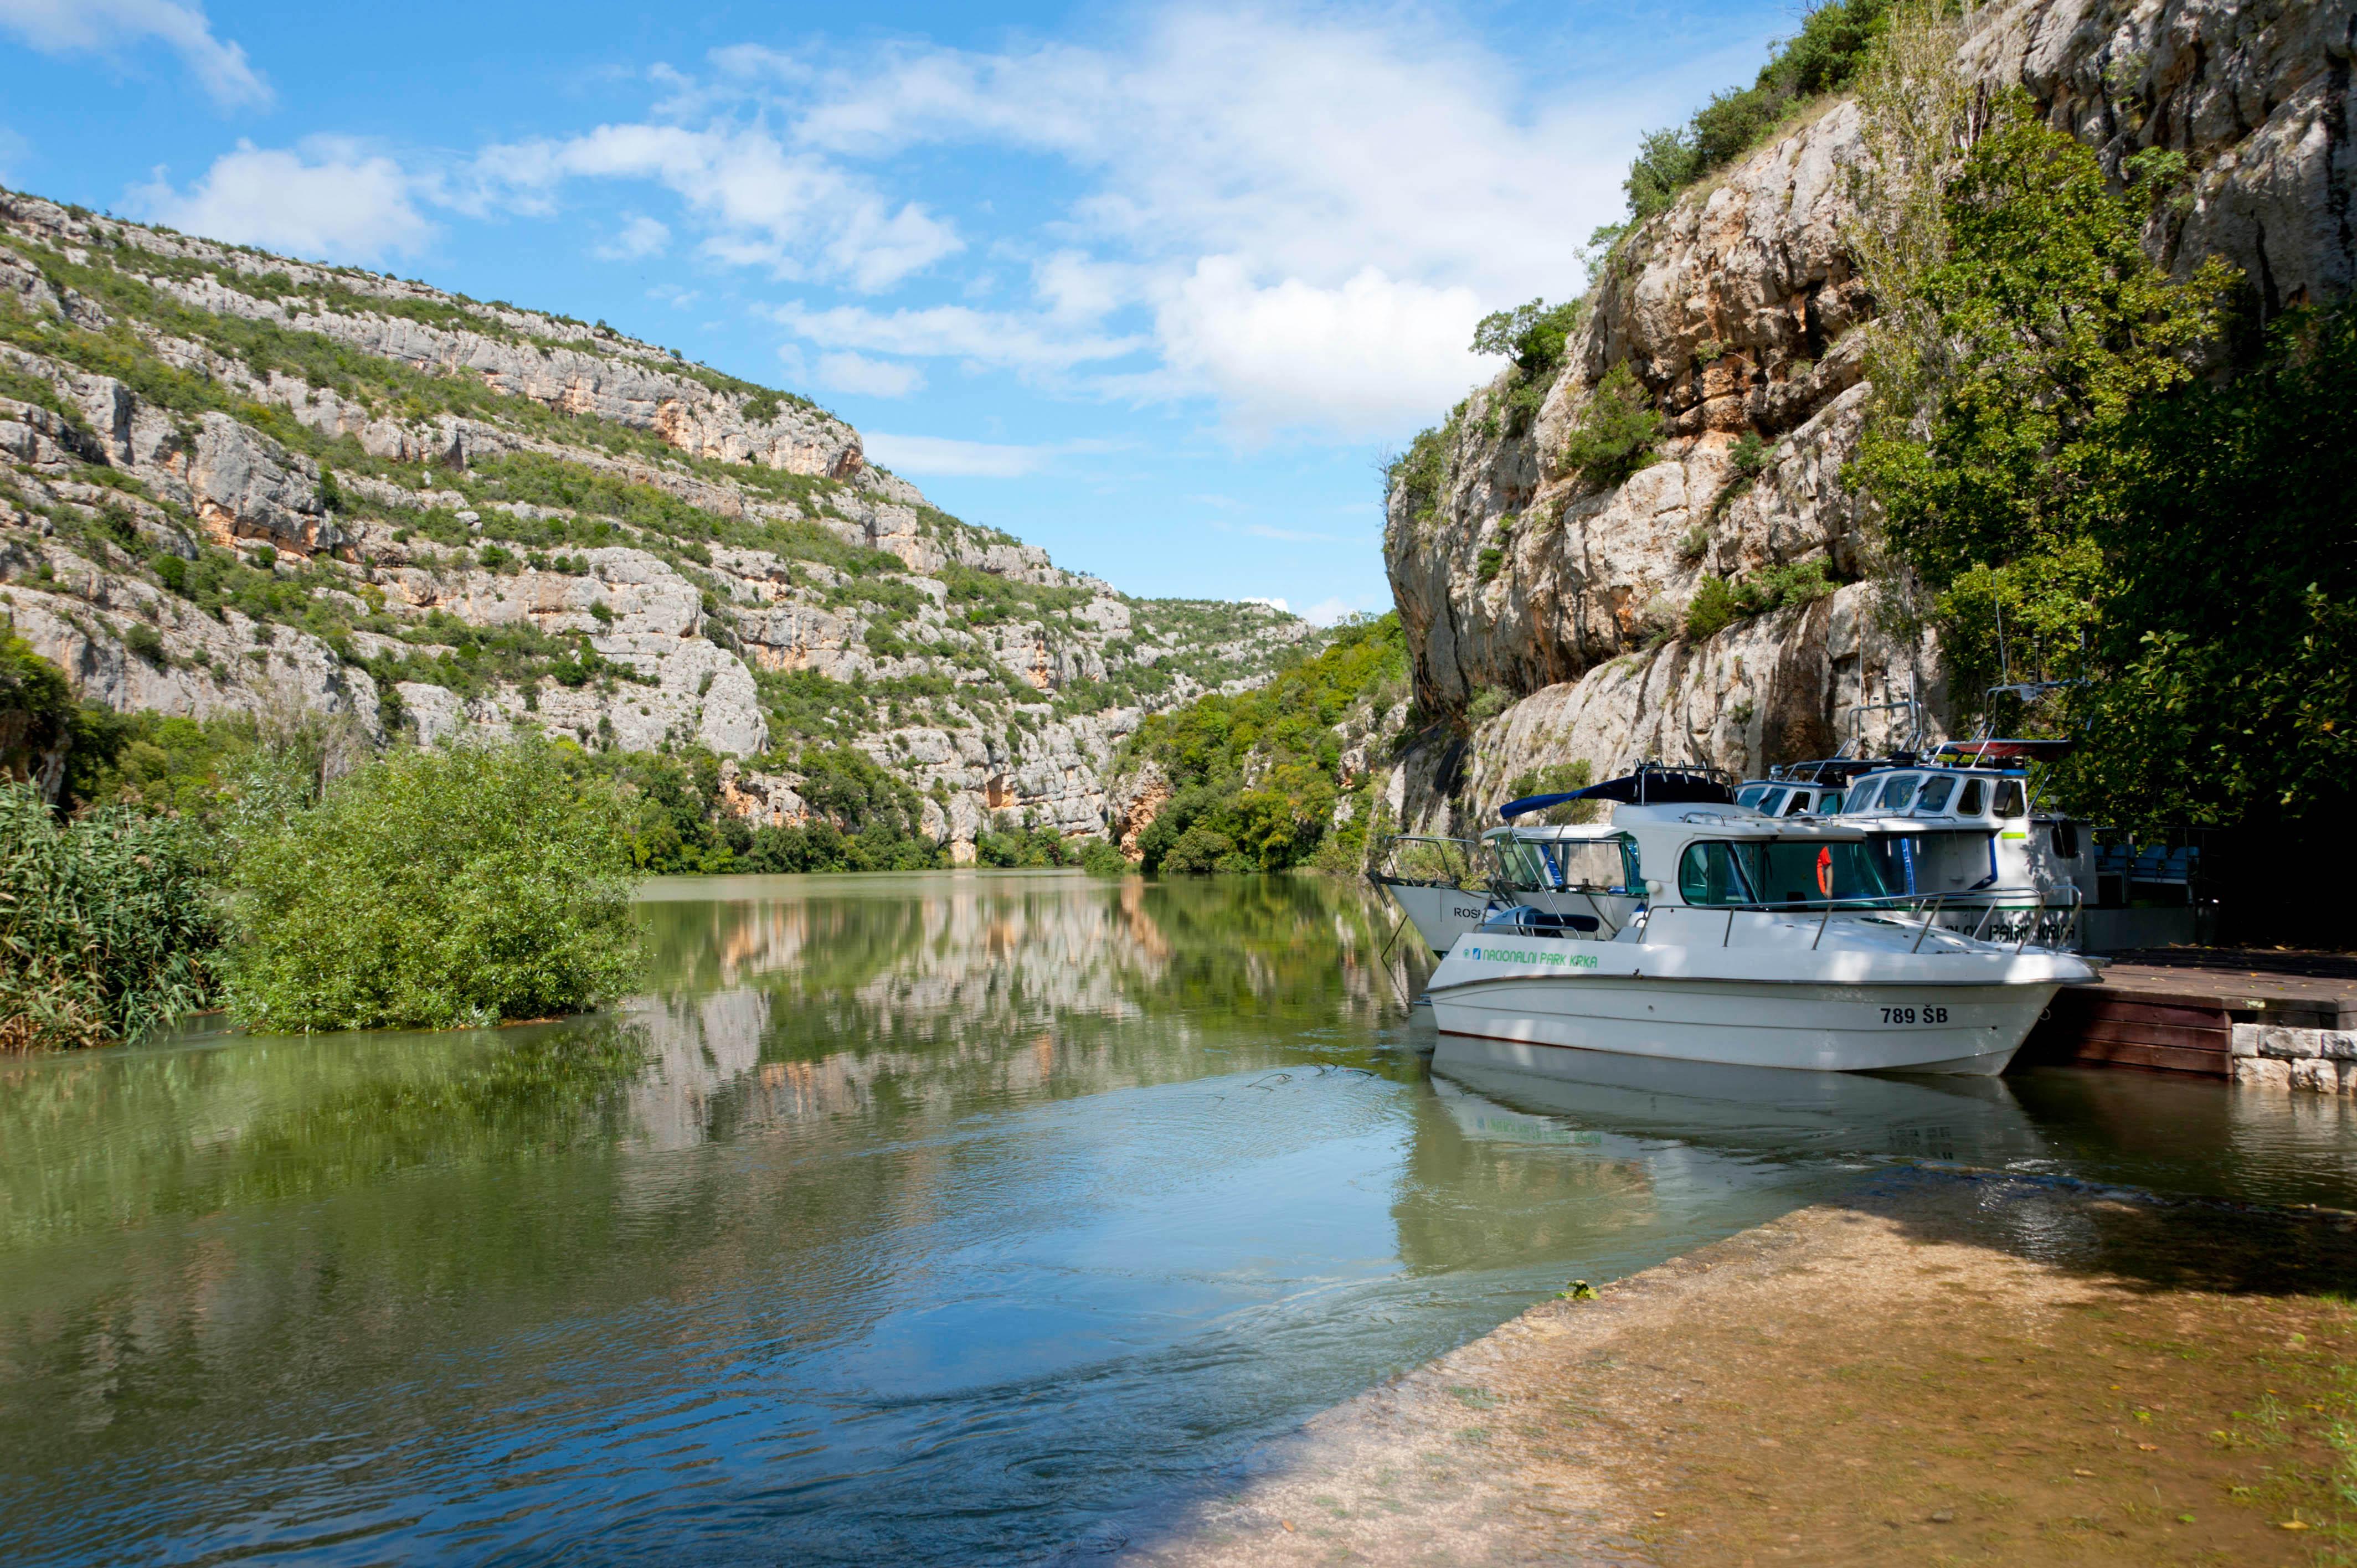 9519-Parc national Krka (Dalmatie du Nord)